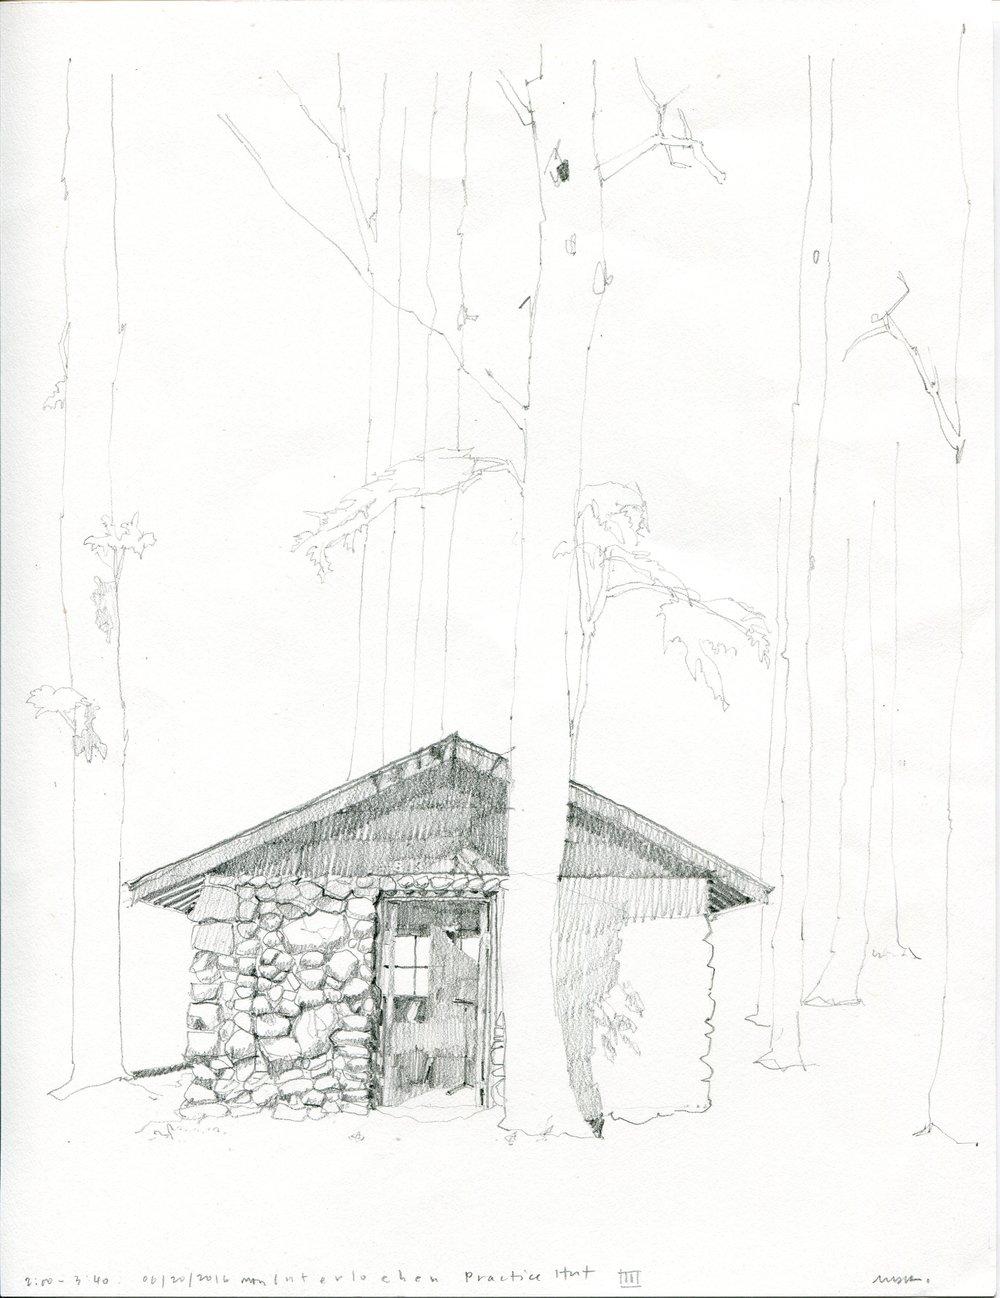 2016 Interlochen practice hut IIII001.jpg